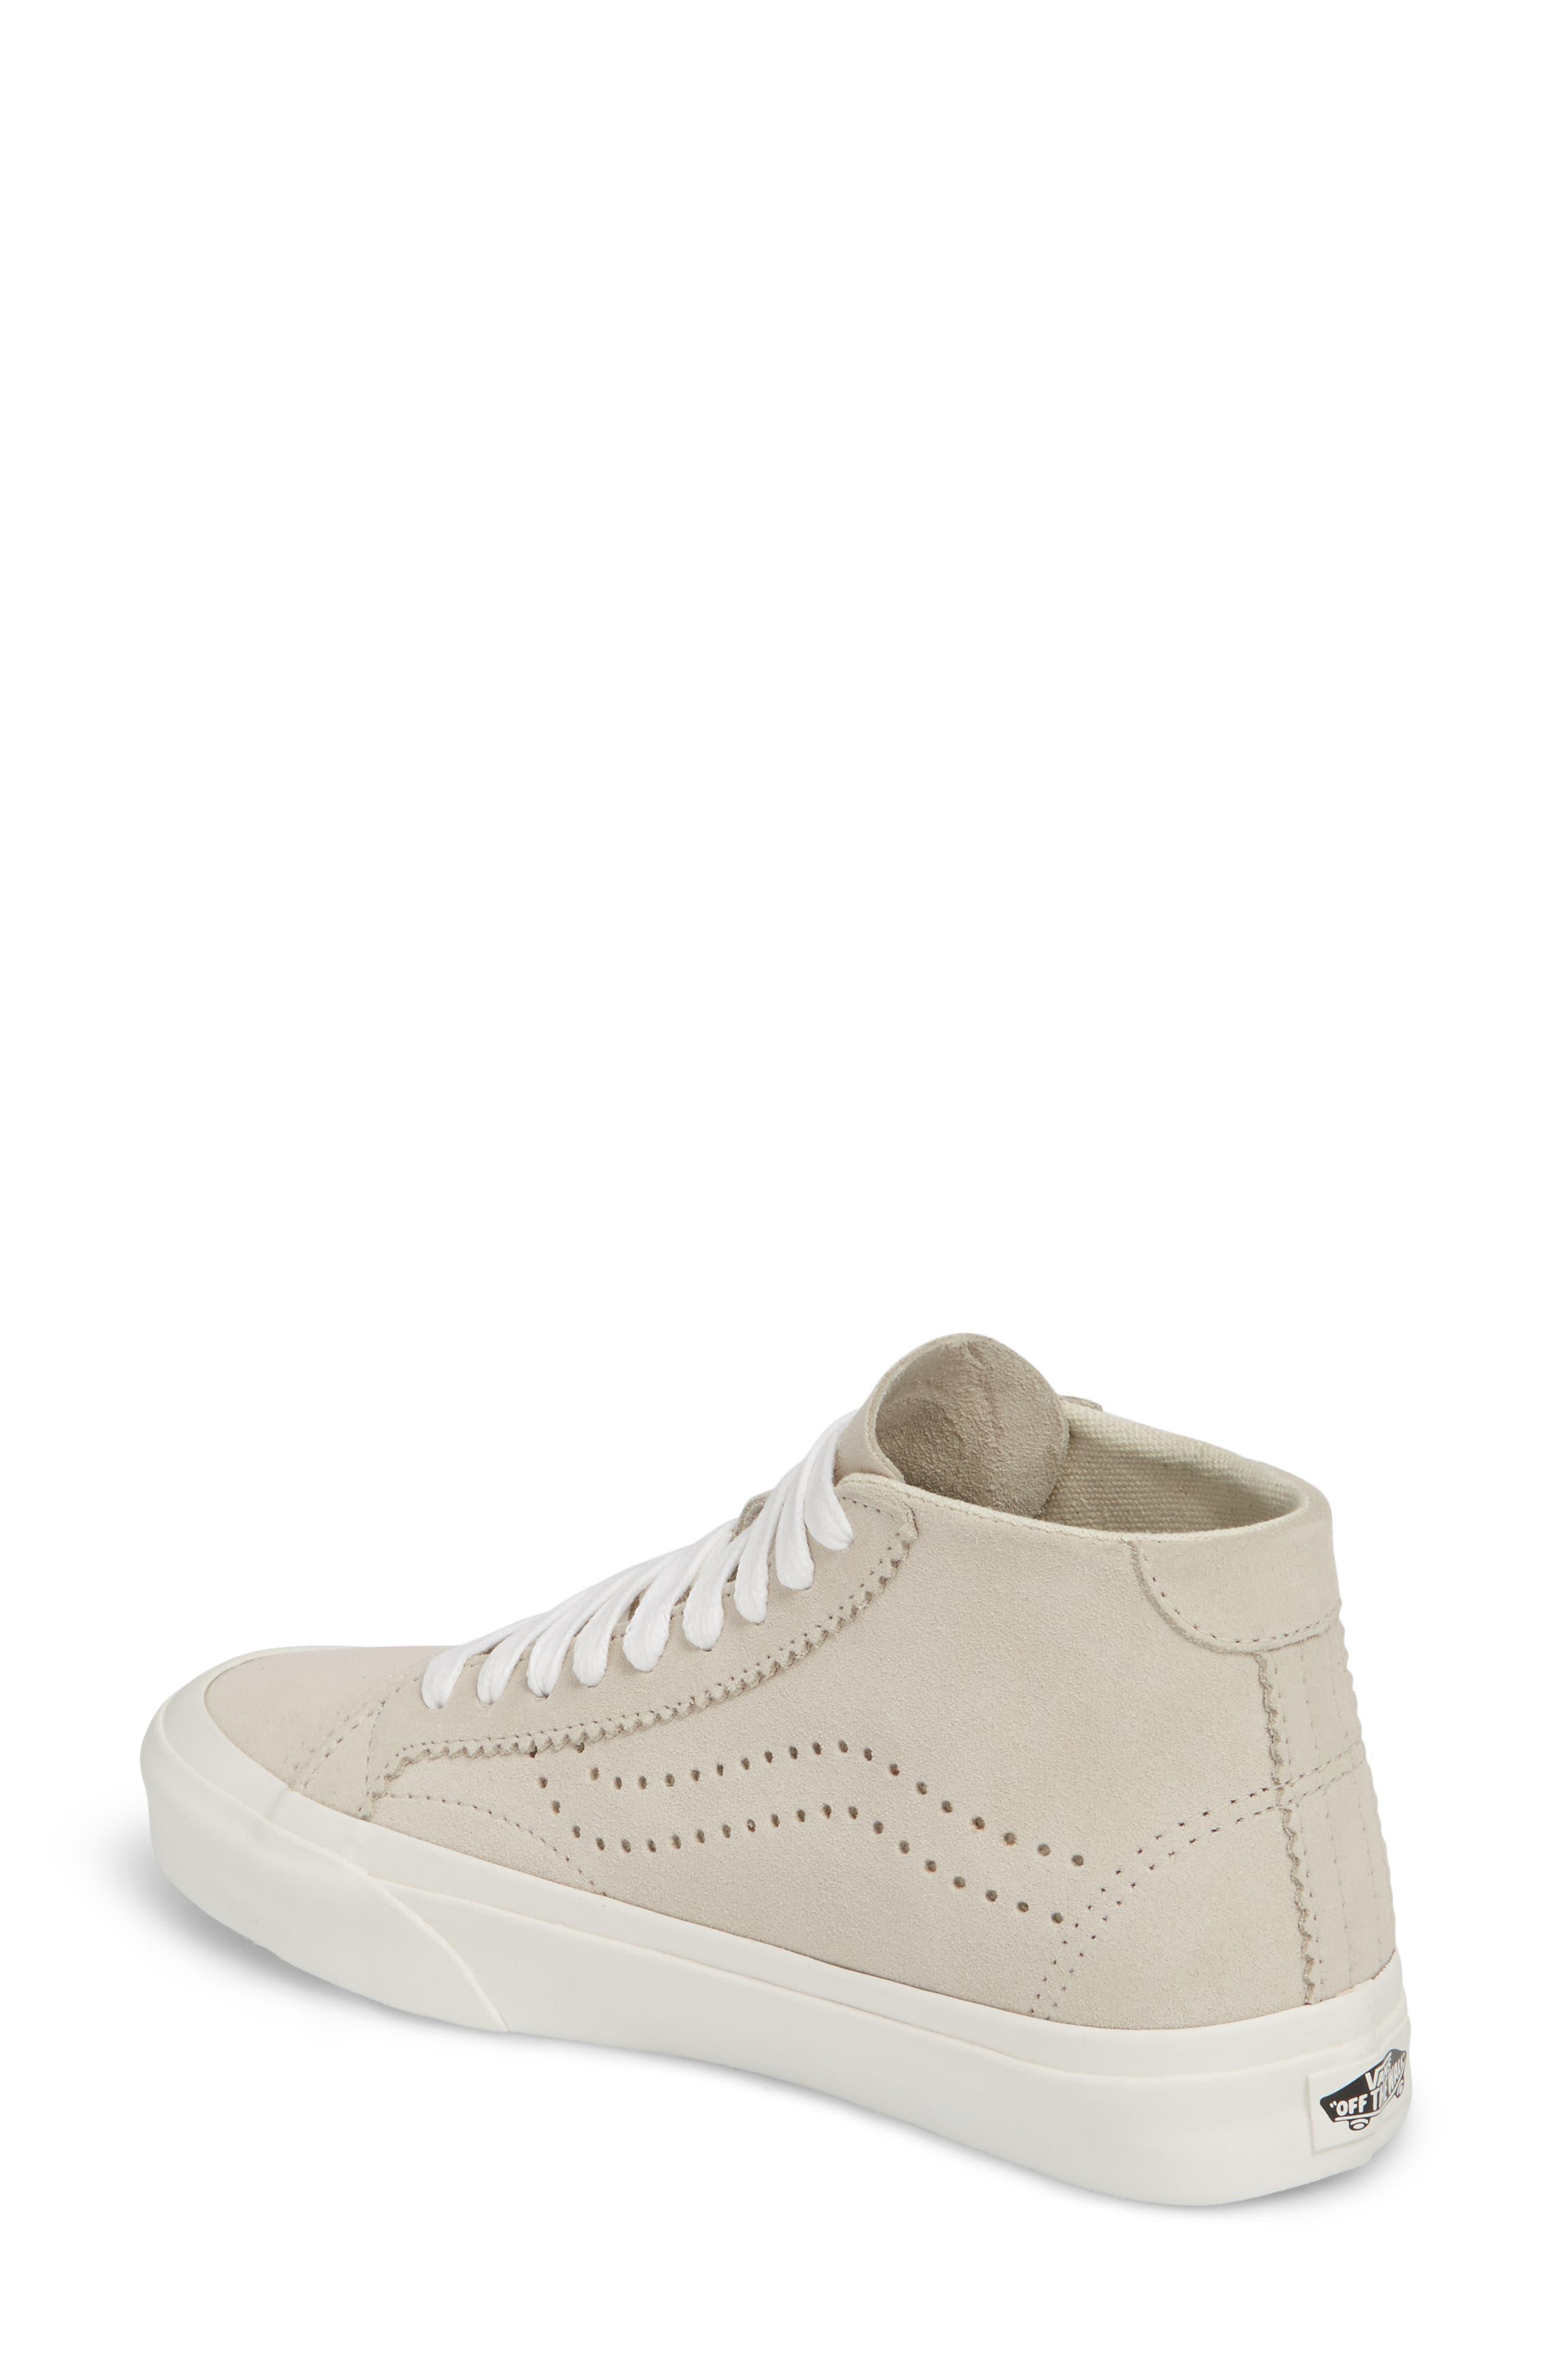 Court DX Mid Sneaker,                             Alternate thumbnail 4, color,